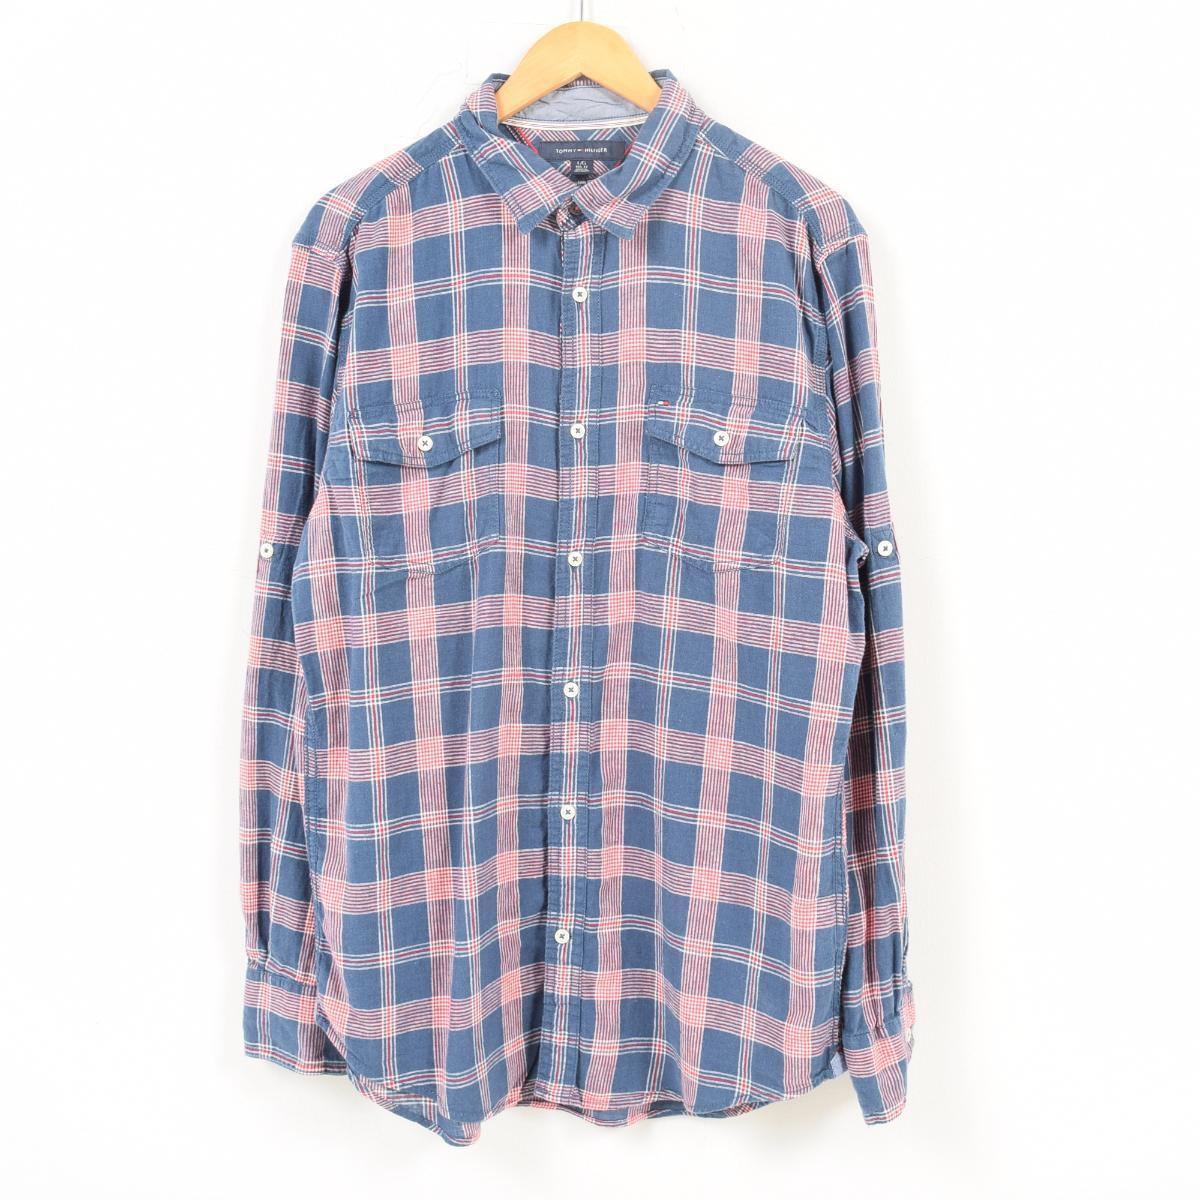 Vintage Clothing Jam Tommy Hilfiger Long Sleeves